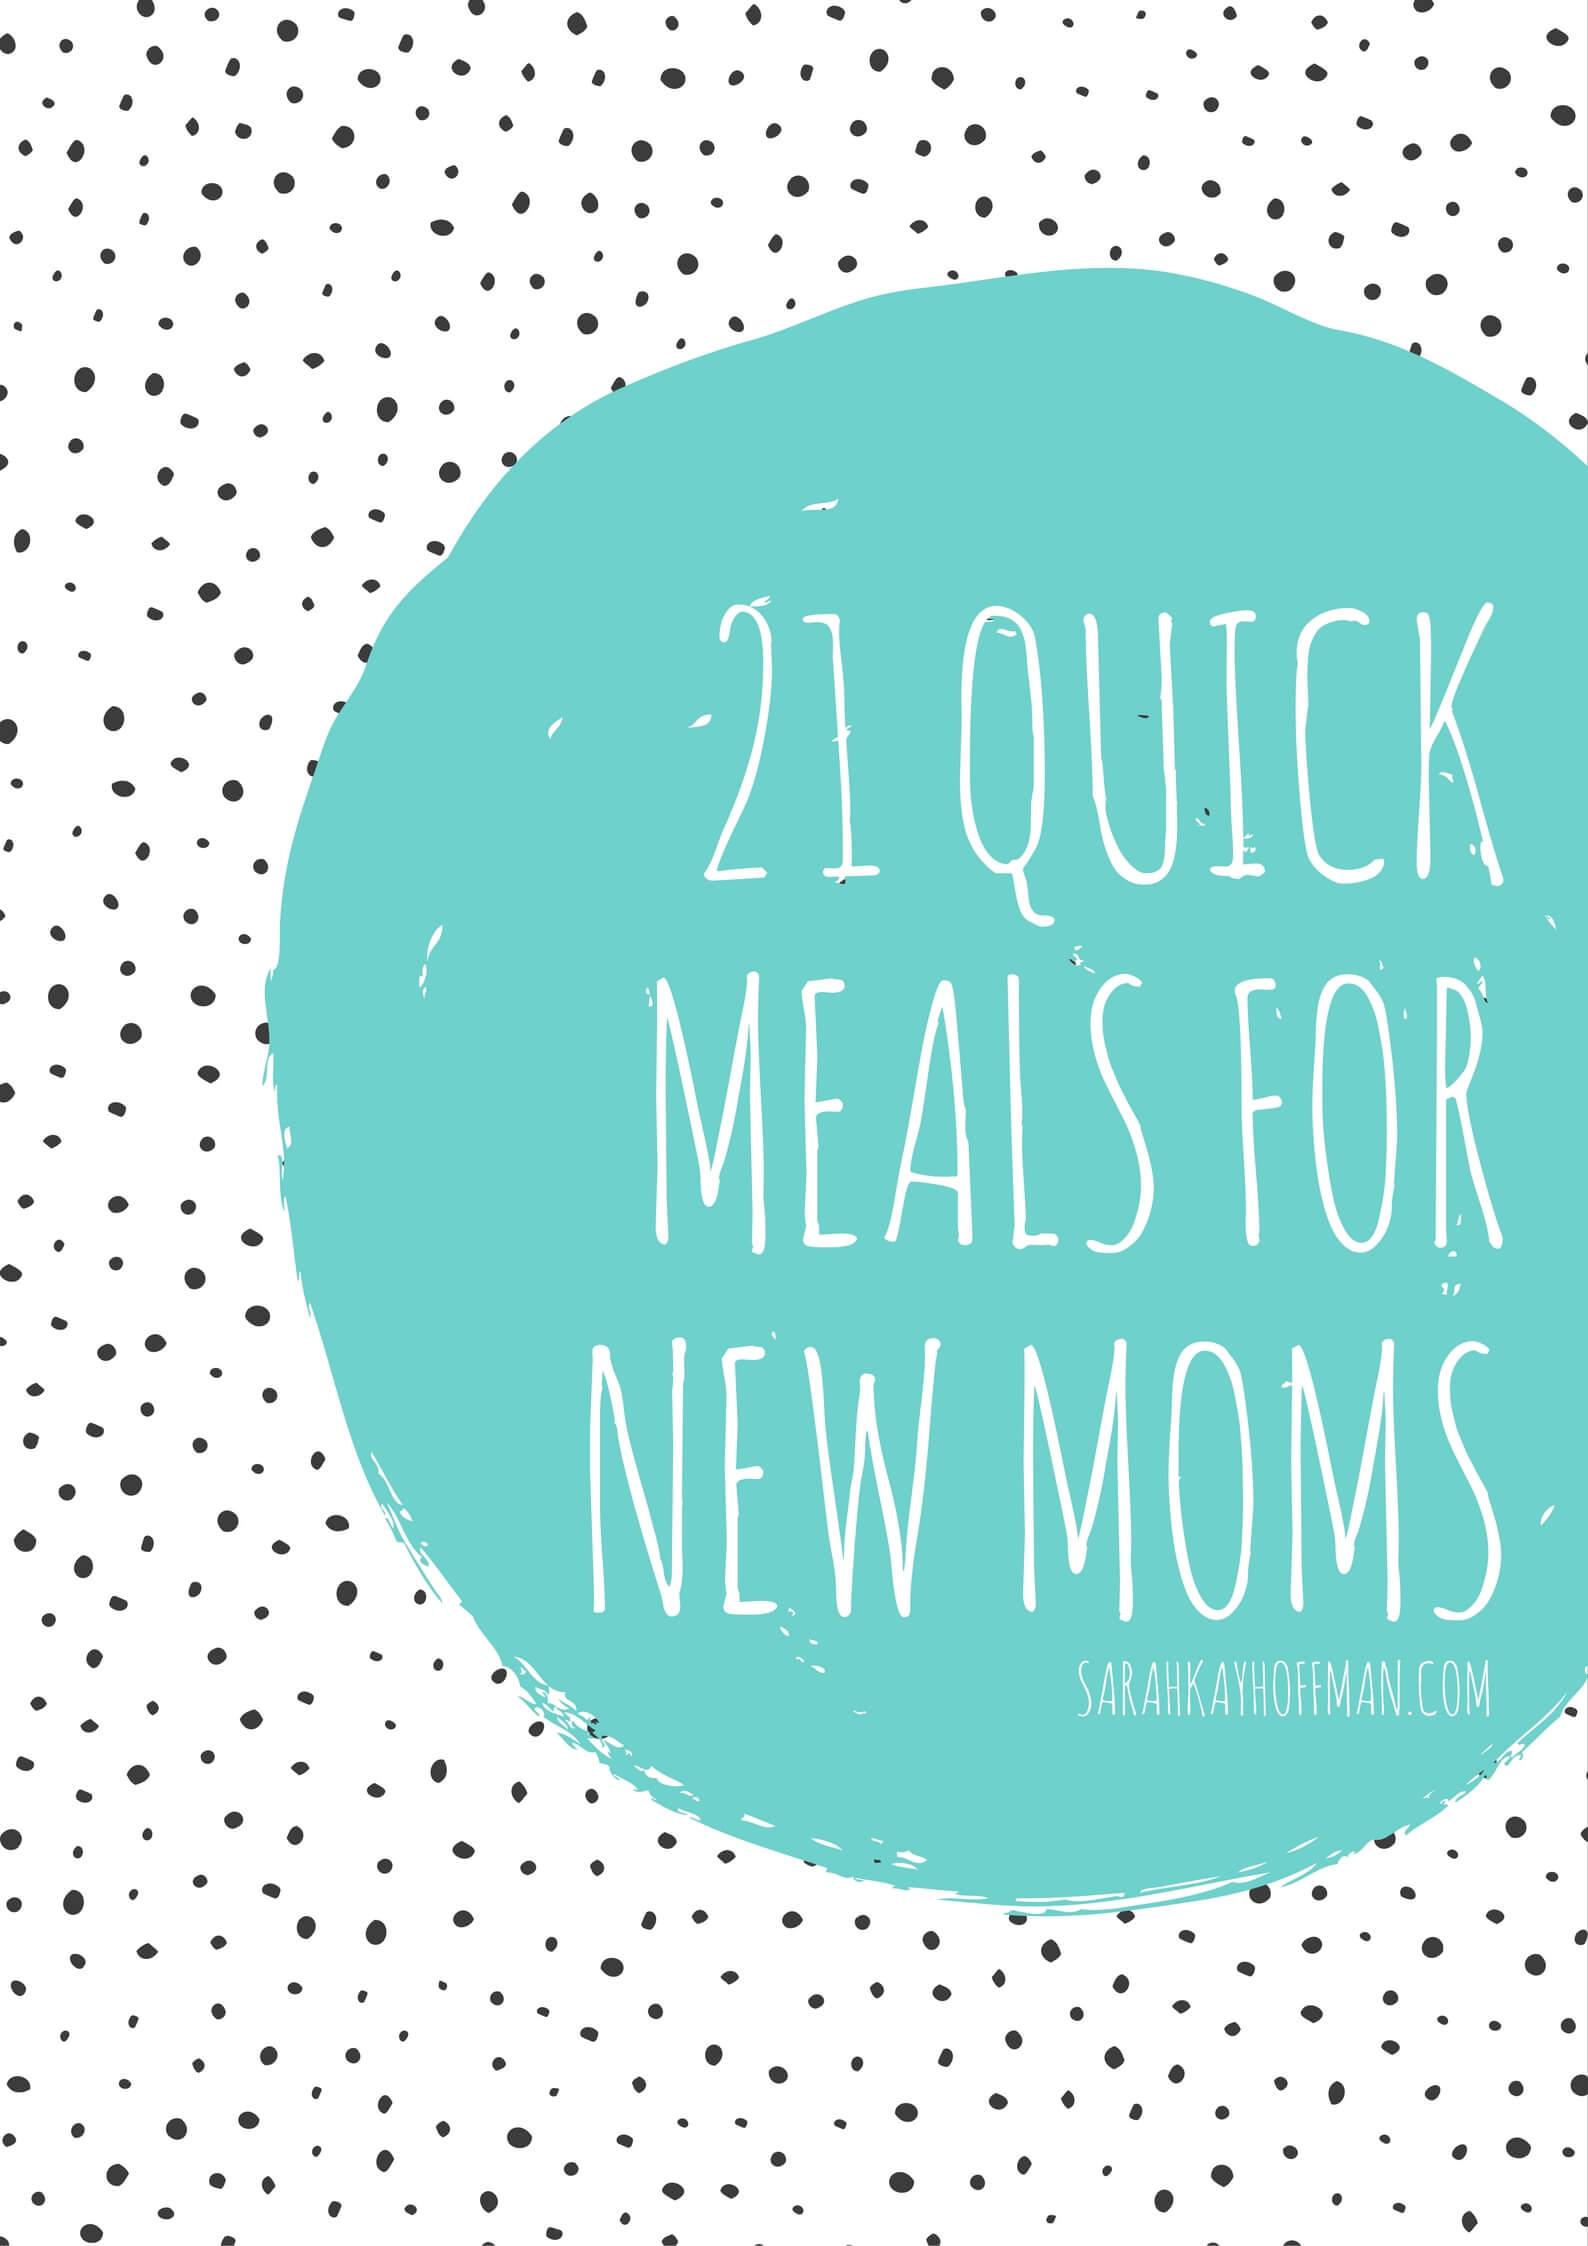 21 Quick Meals for New Moms sarahkayhoffman.com Organic Recipes#motherhood #healthyliving #mealprep #recipes #healthcoach